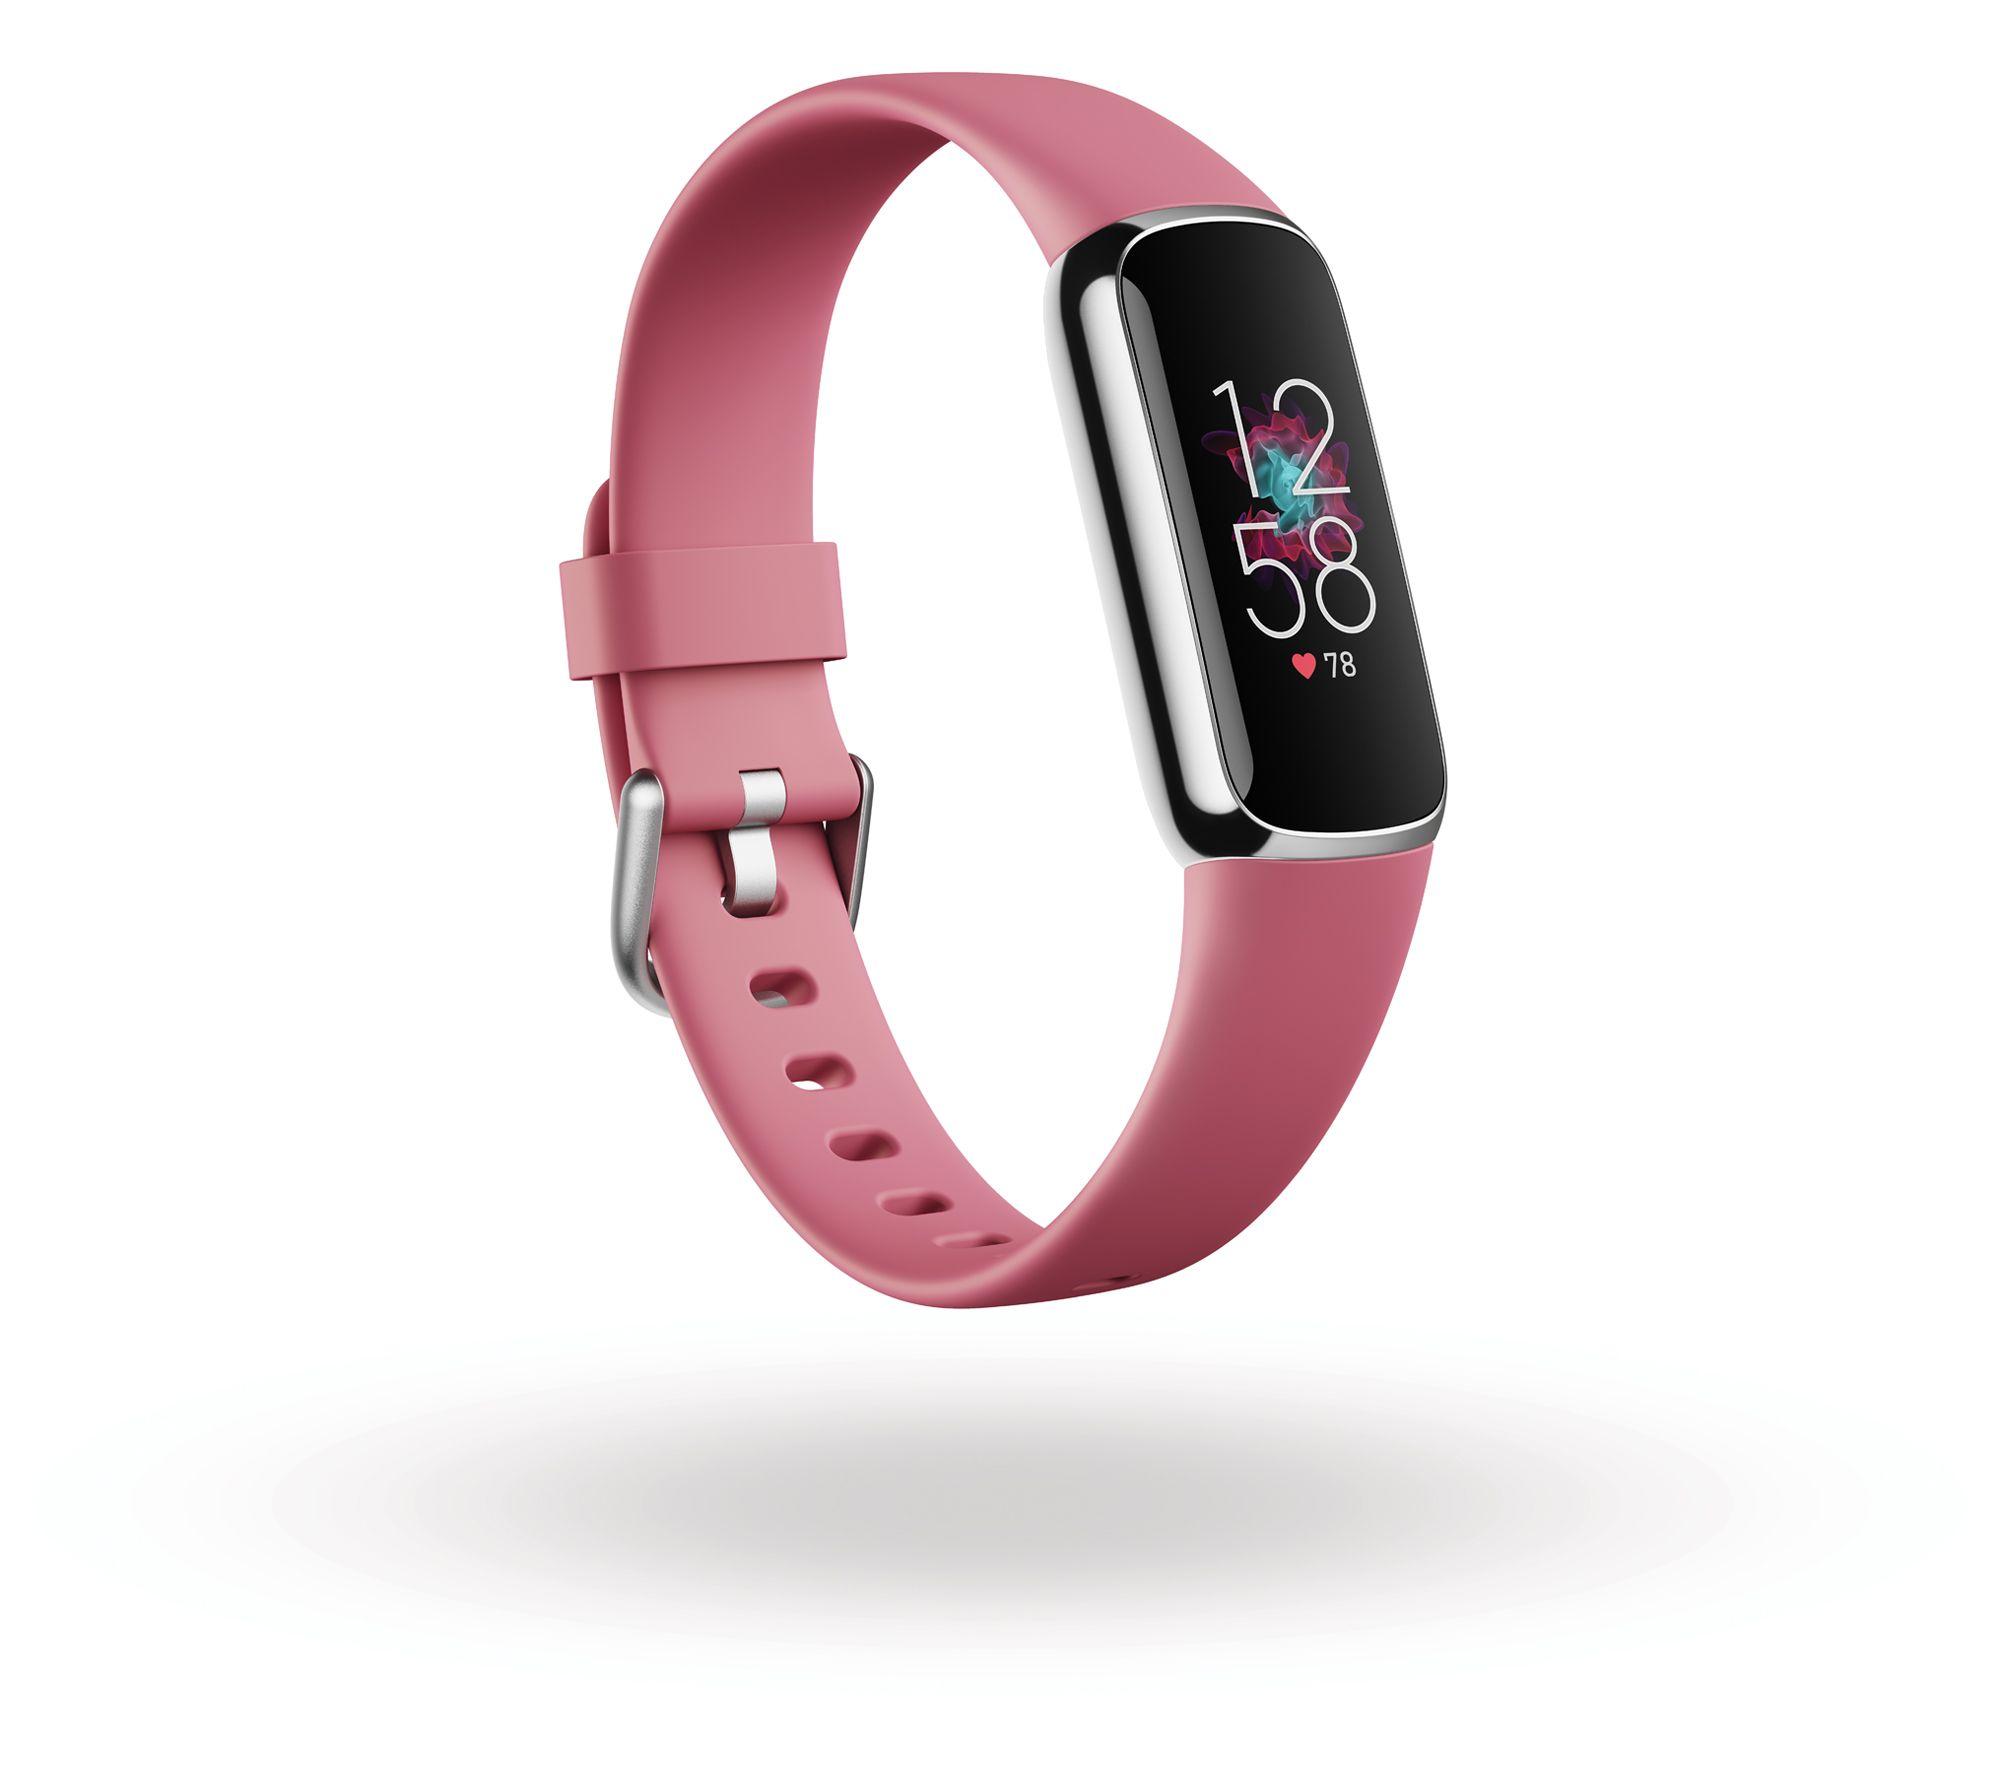 Ships 10/18 Fitbit Luxe Fitness & Wellness Smart Wearable